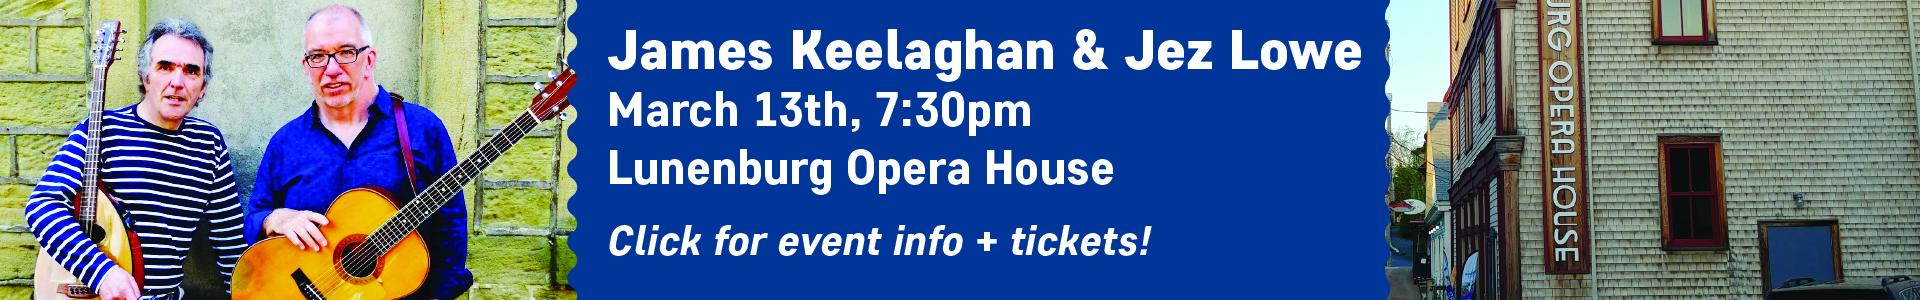 James Keelaghan-web banner